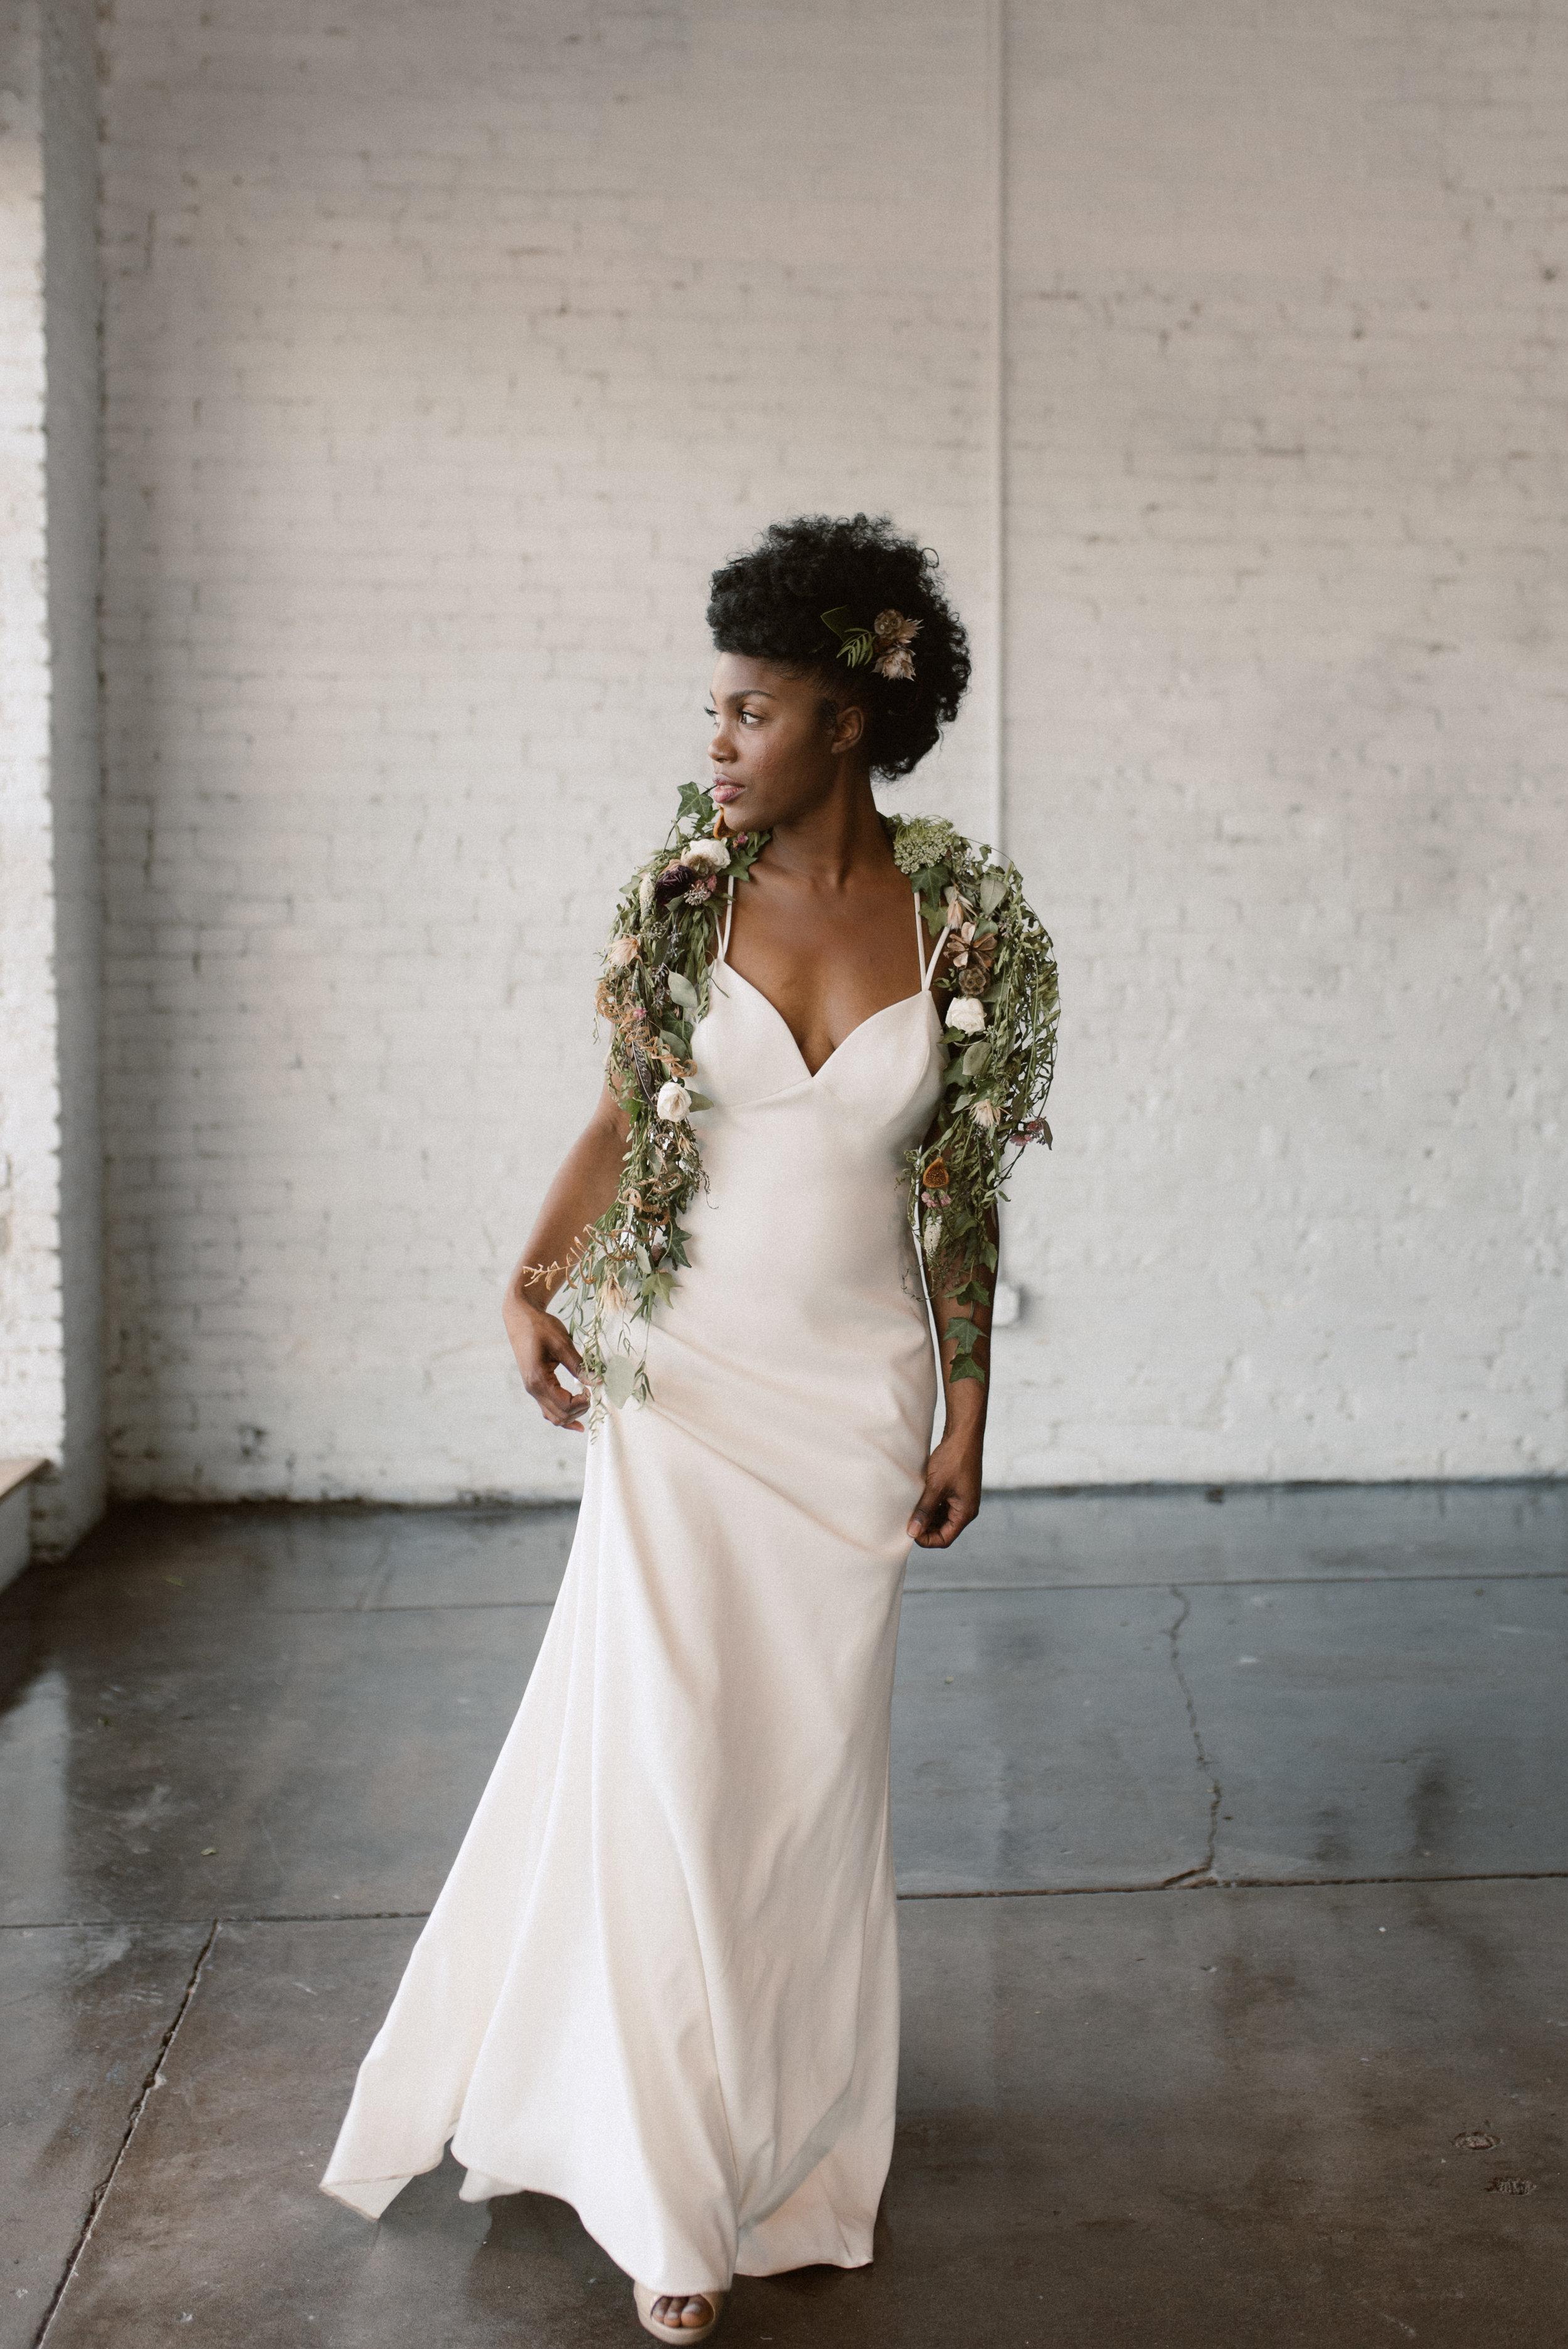 haus-820-minimal-editorial-wedding-styled-shoot-83.jpg